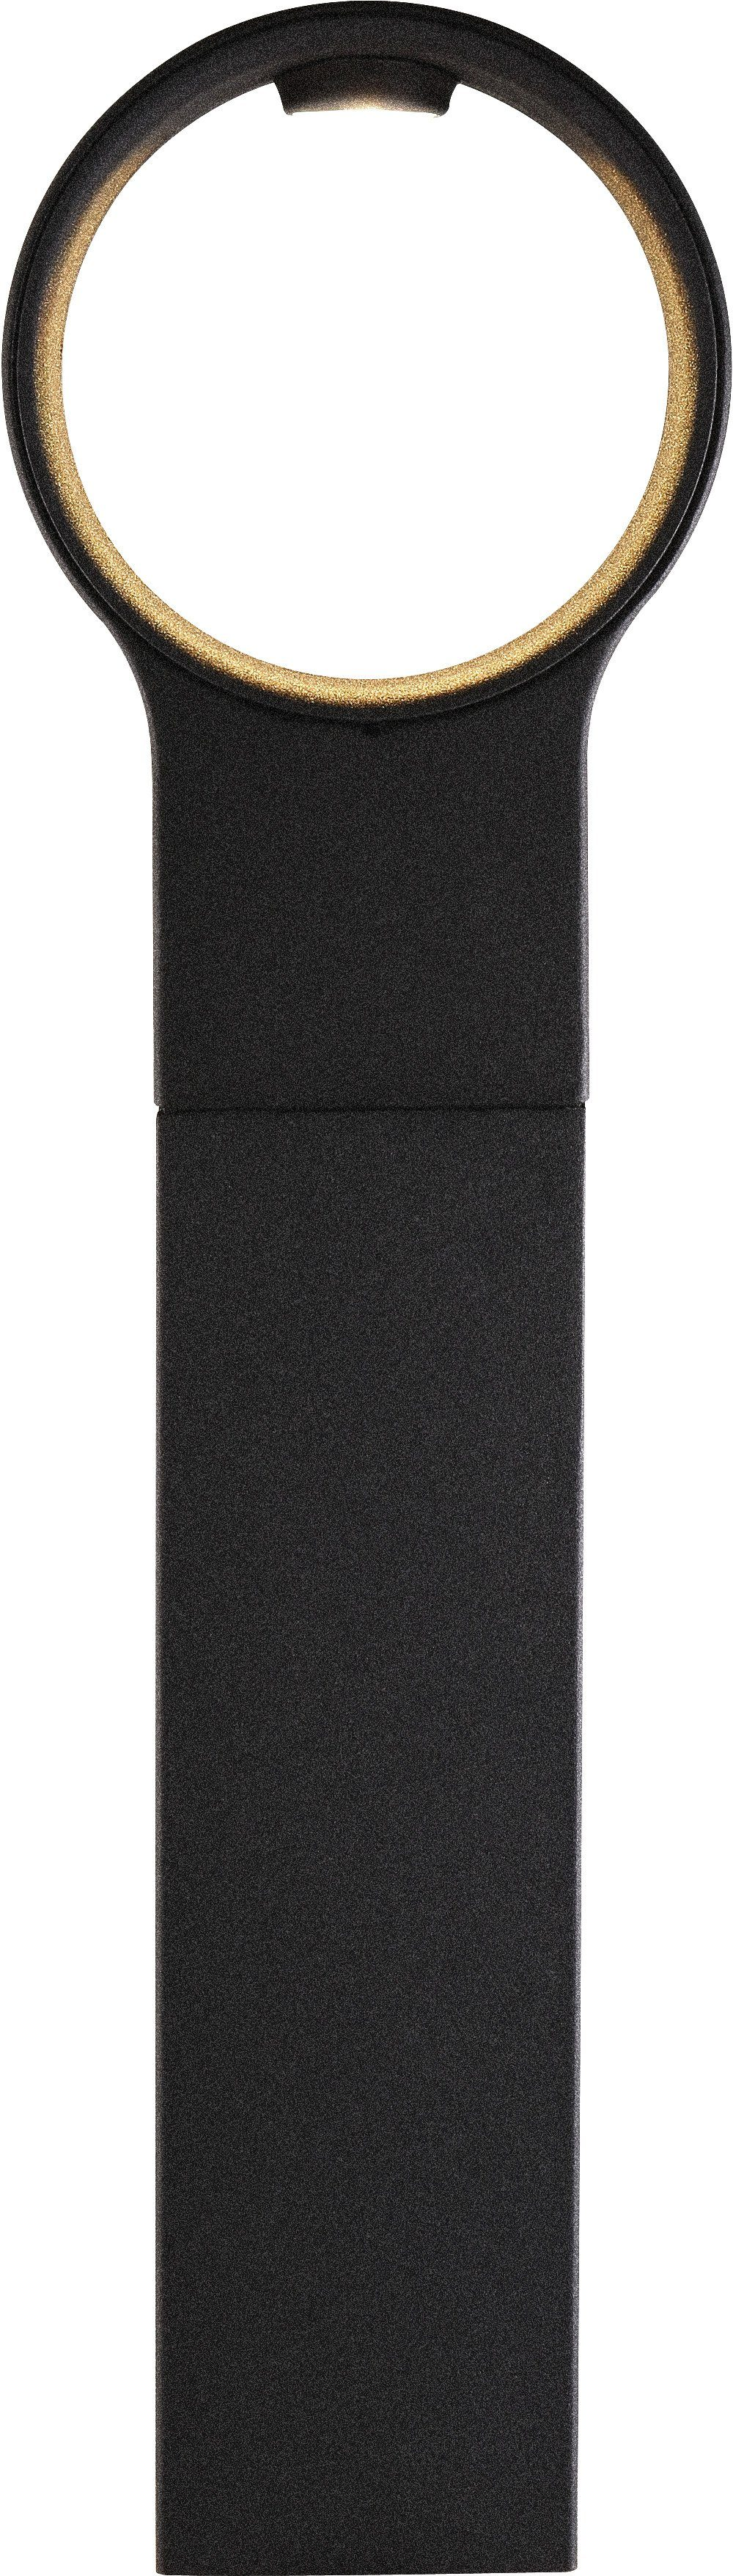 Nordlux LED Außenleuchte, 1 flg., Sockelleuchte, »RING«